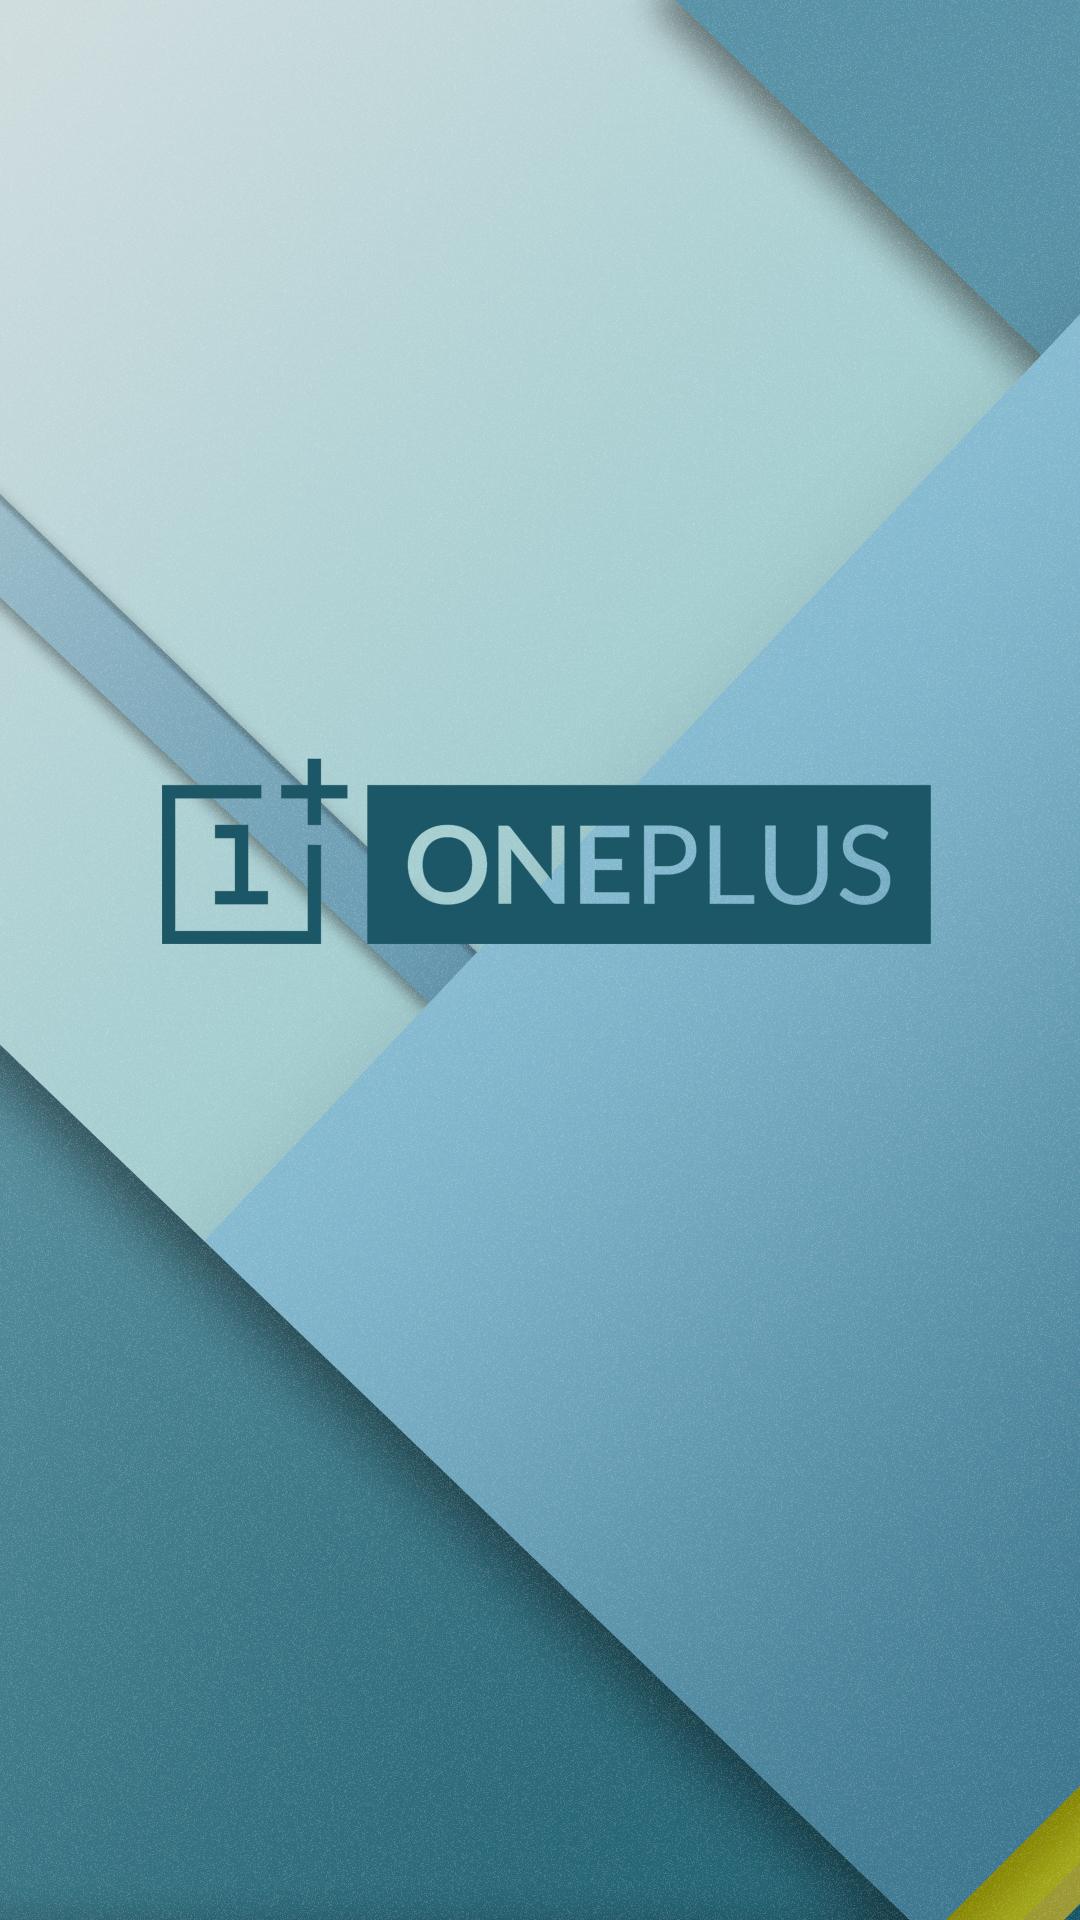 ONEPLUS material design wallpaper   OnePlus Forums 1080x1920